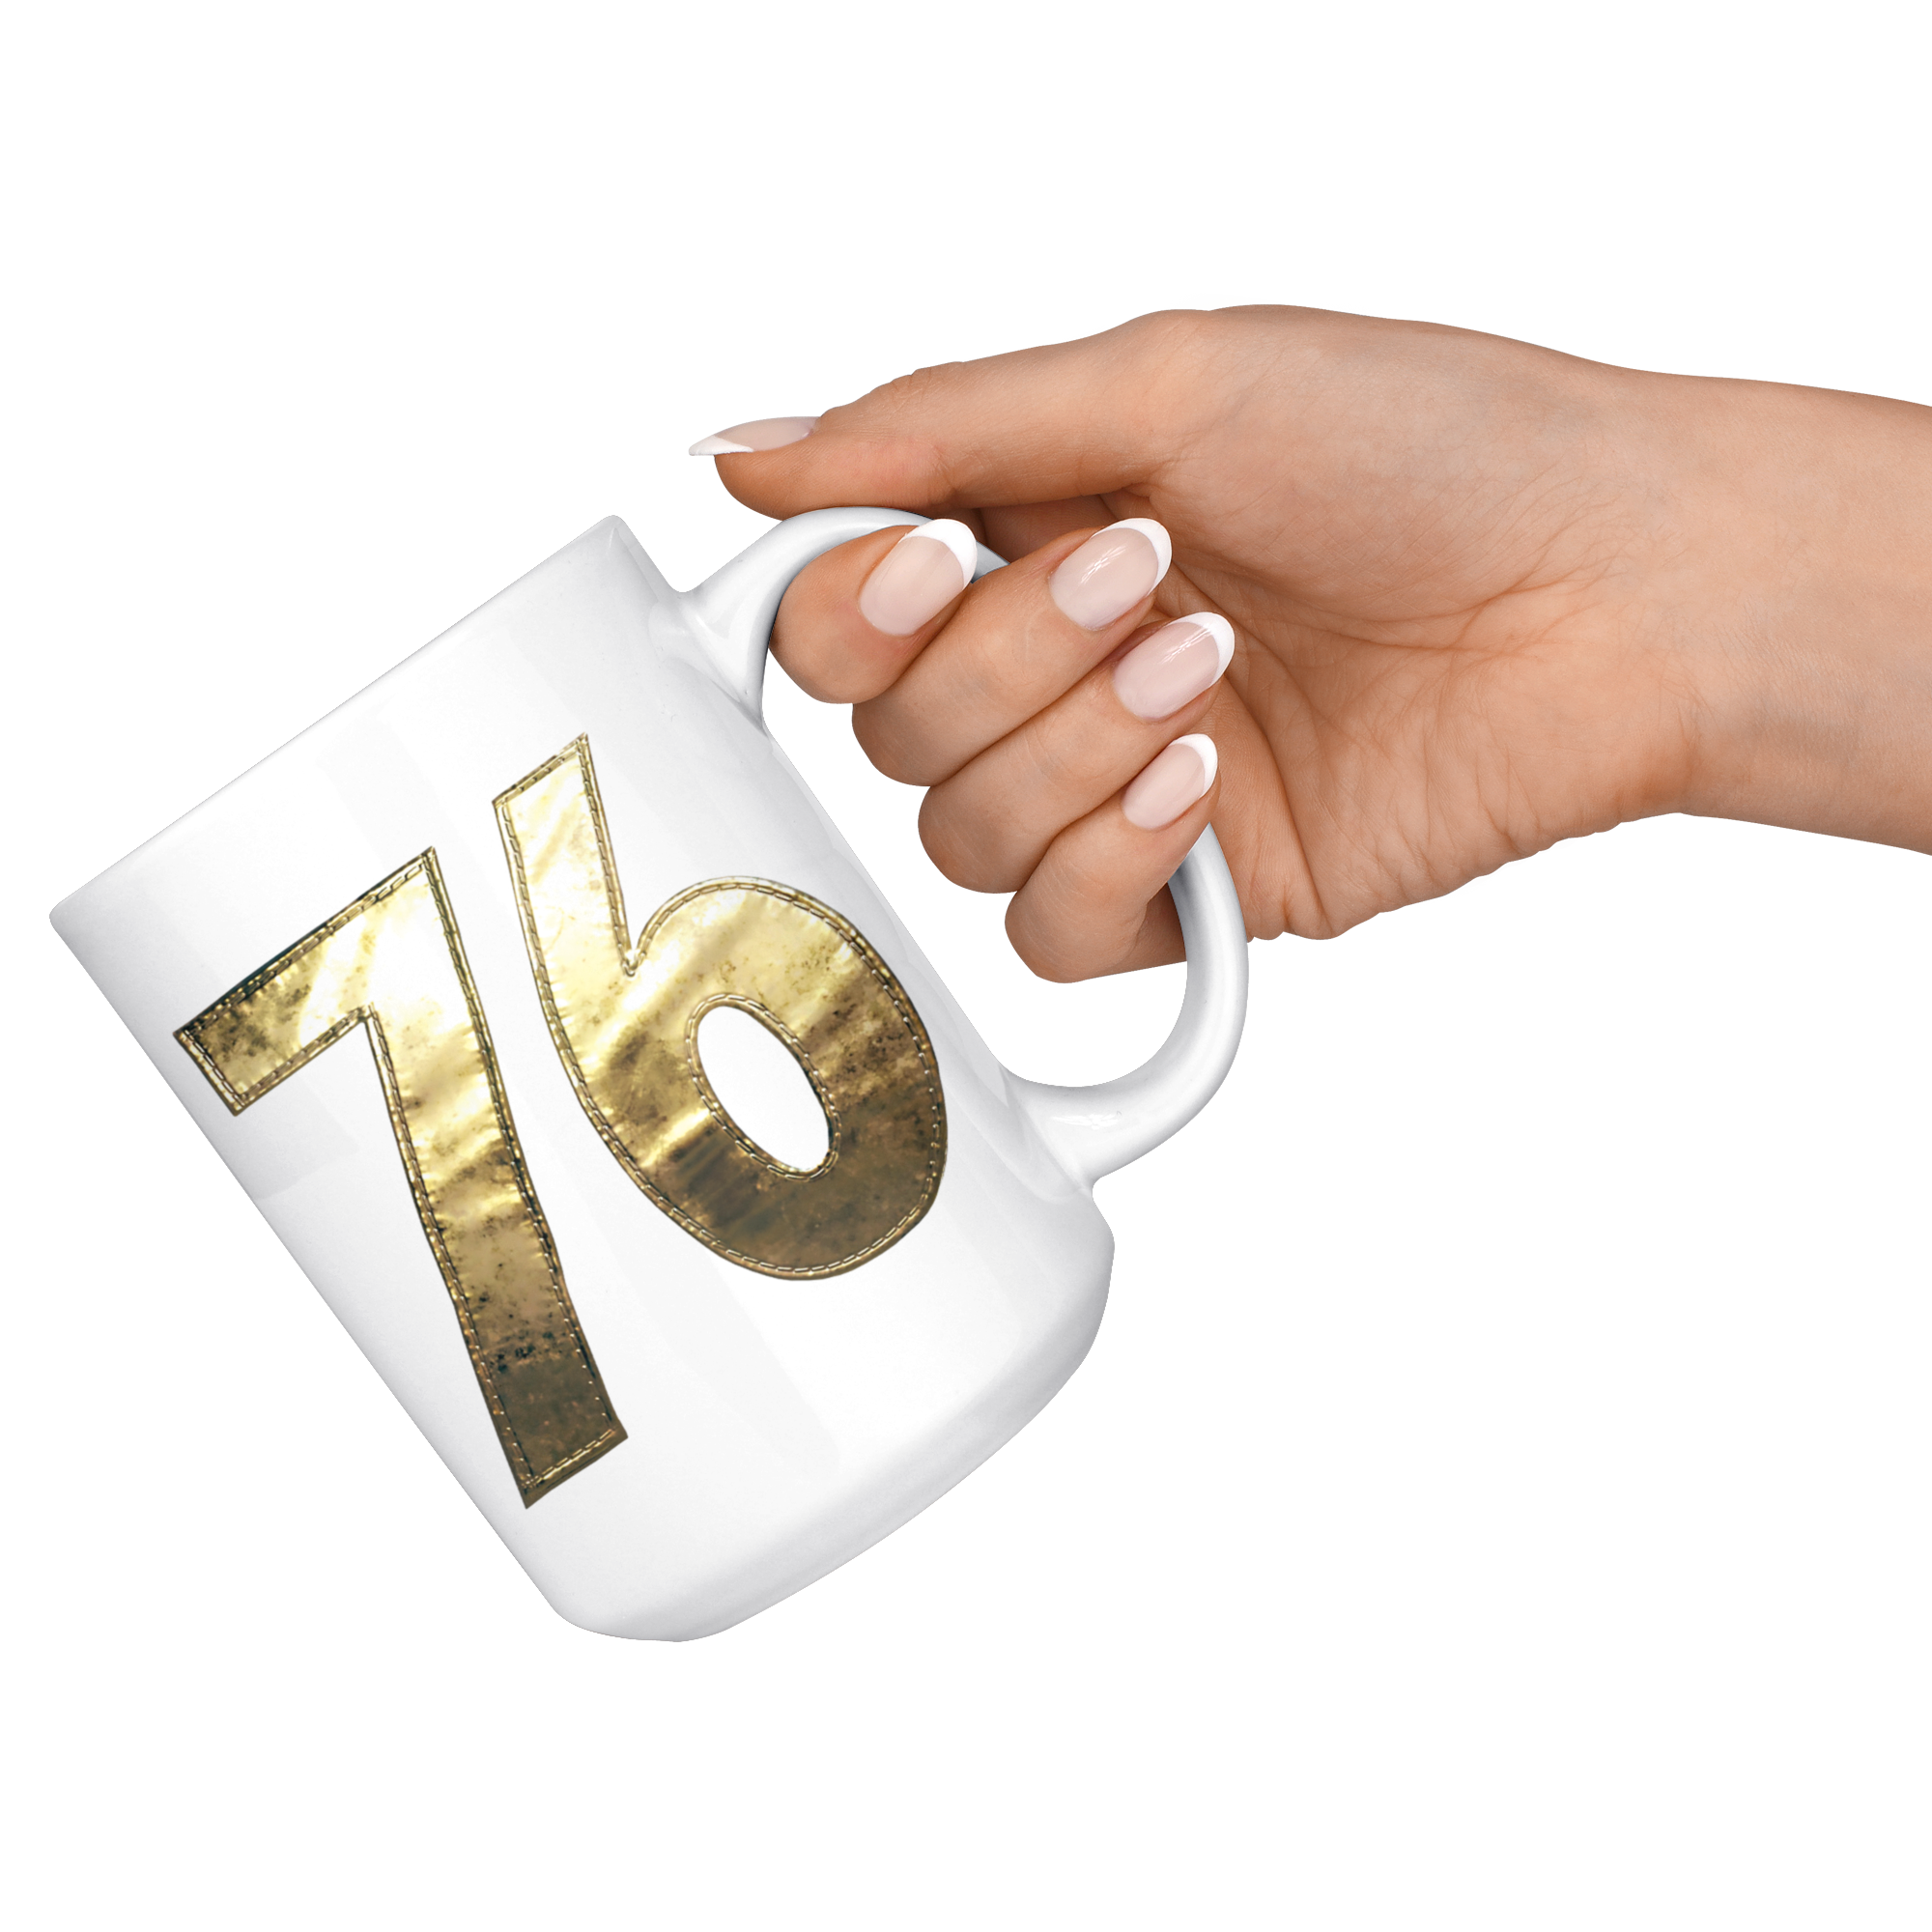 Fallout 76 Logo Mug Fallout Coffee Mug Logo Mugs Handmade Cushions Gaming Clothes